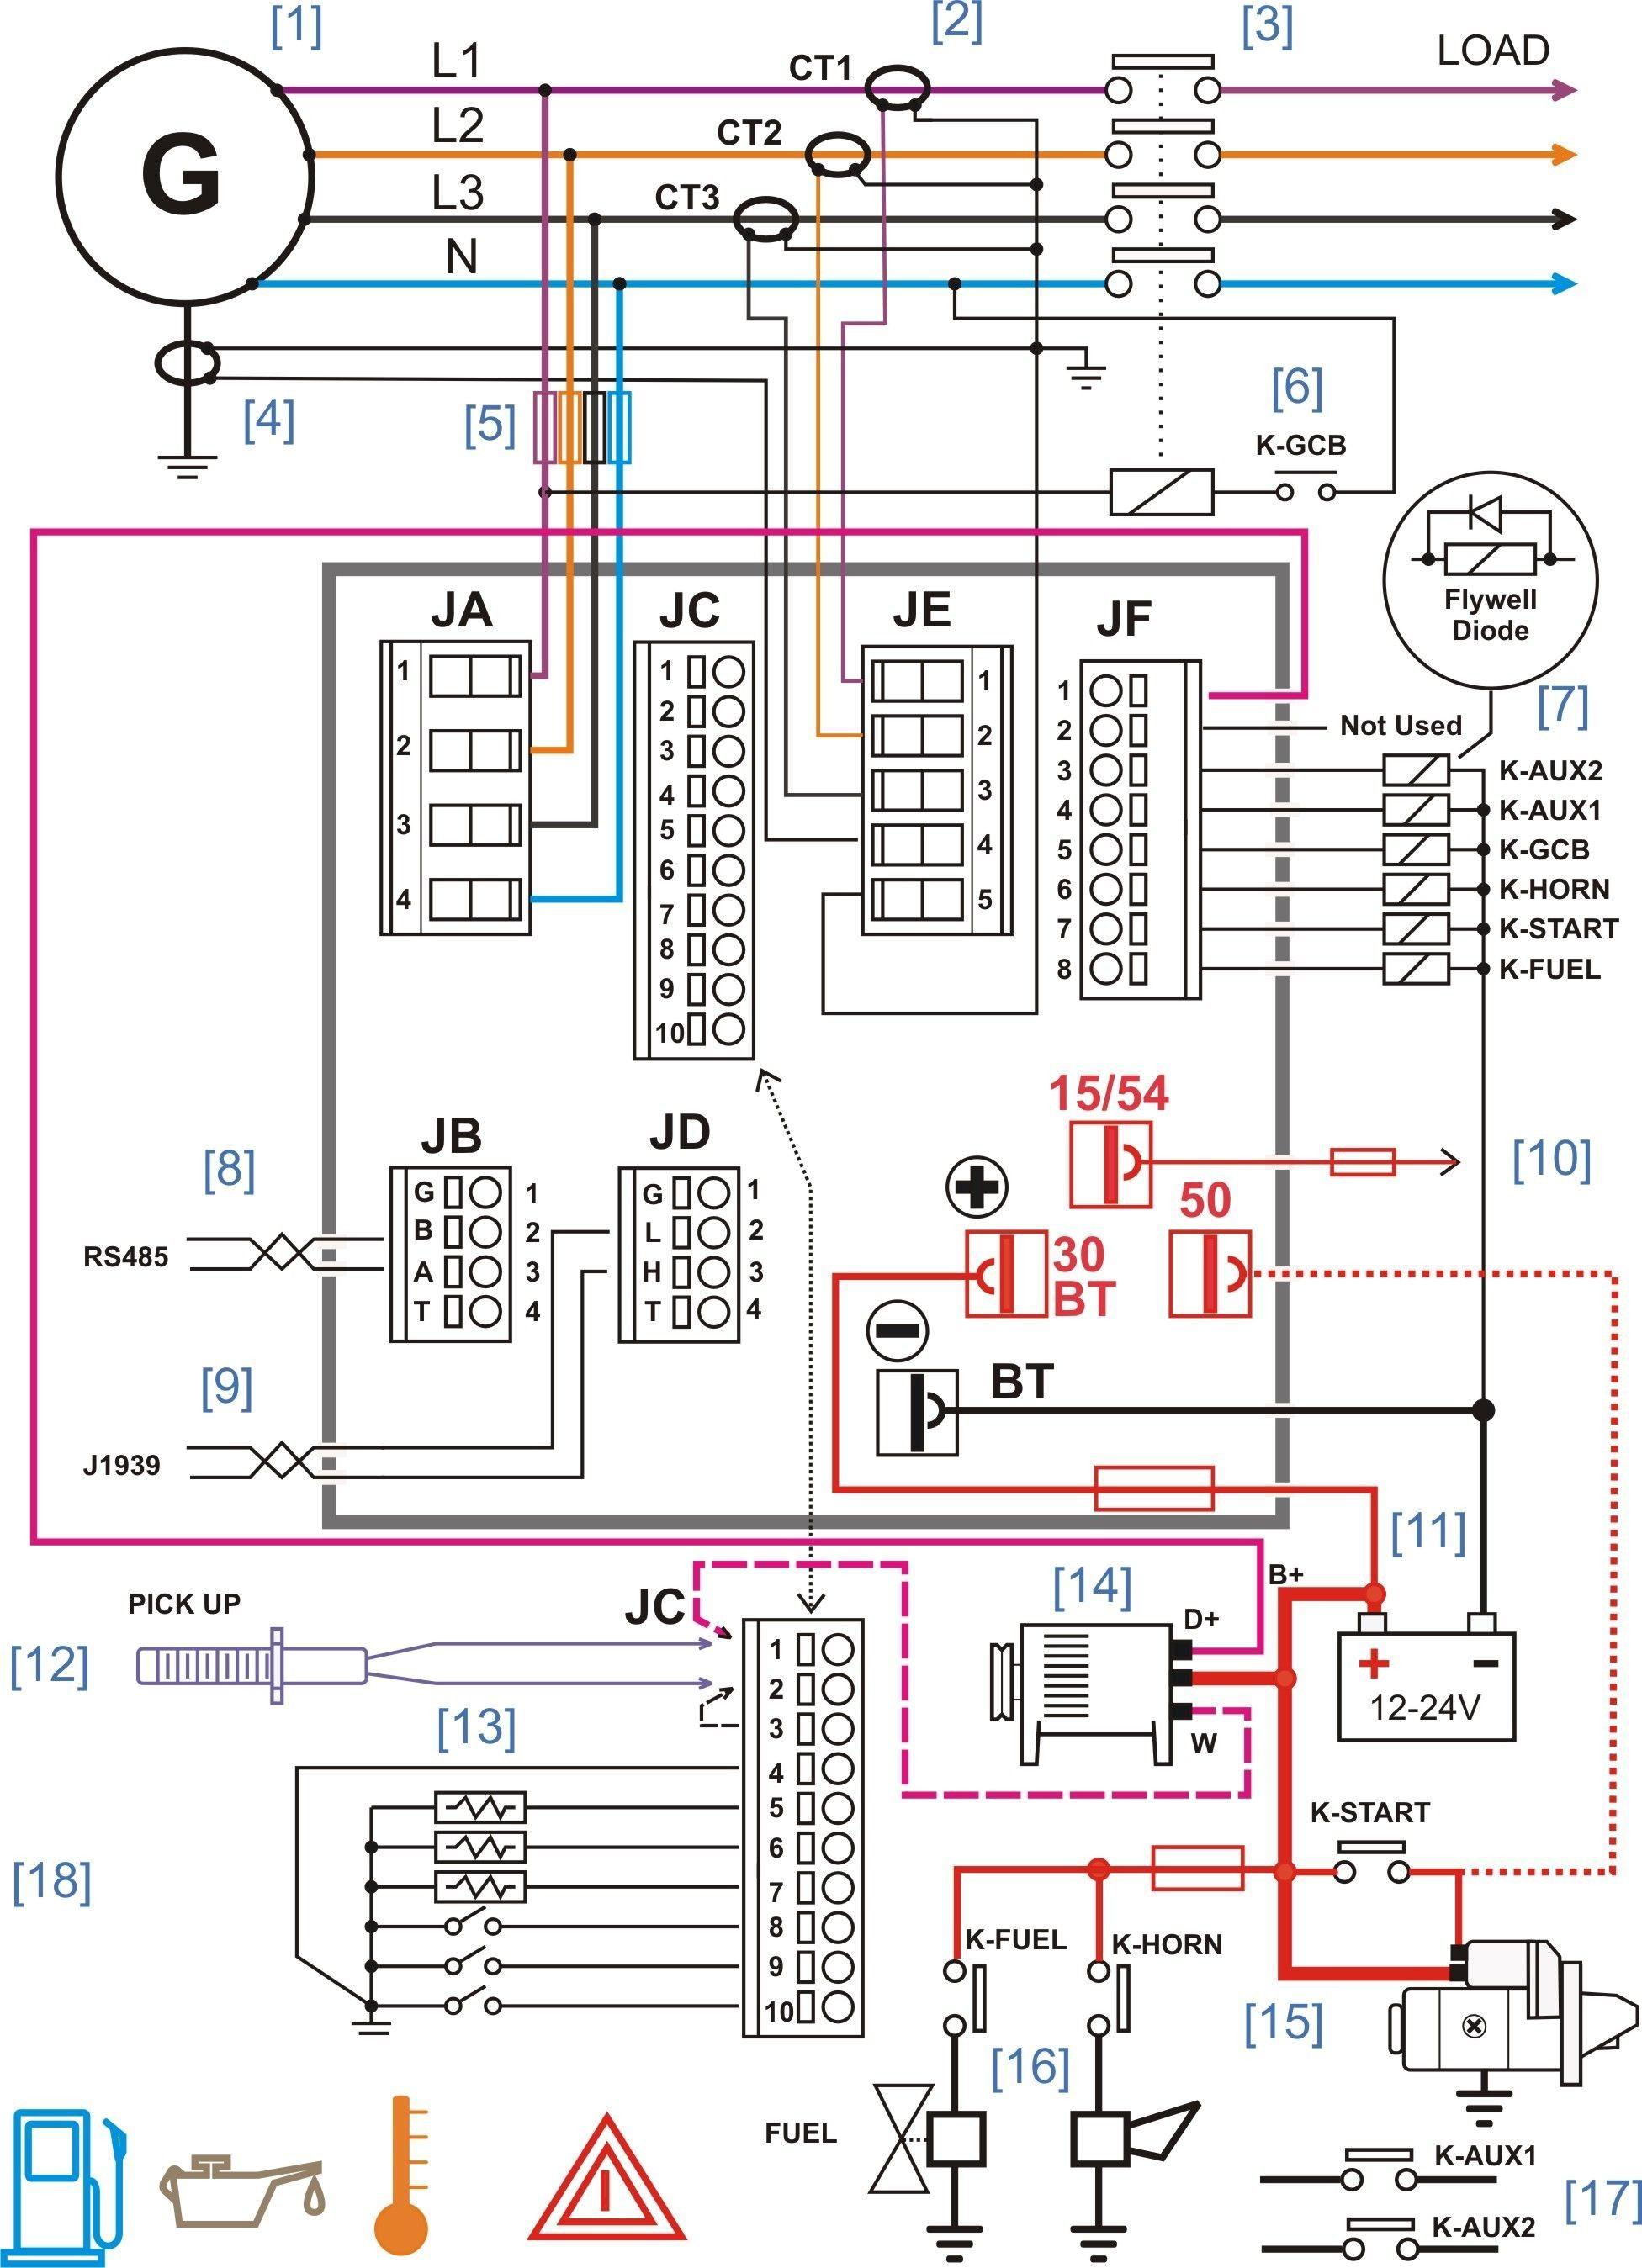 Generator Transfer Switch Wiring Diagram Electrical Circuit Diagram Electrical Diagram Electrical Wiring Diagram